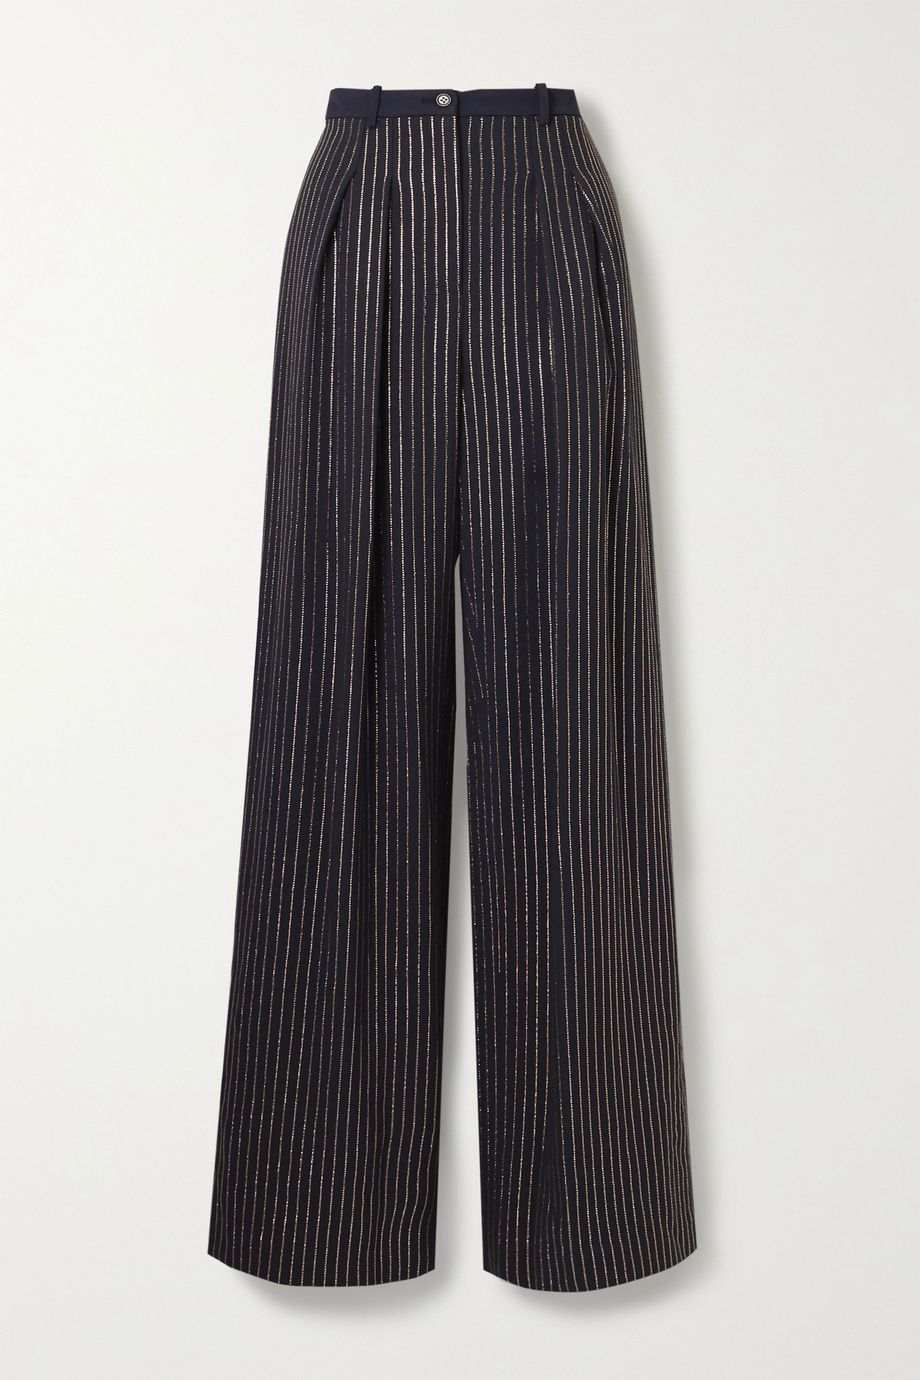 Michael Kors Collection Crystal-embellished crepe wide-leg pants